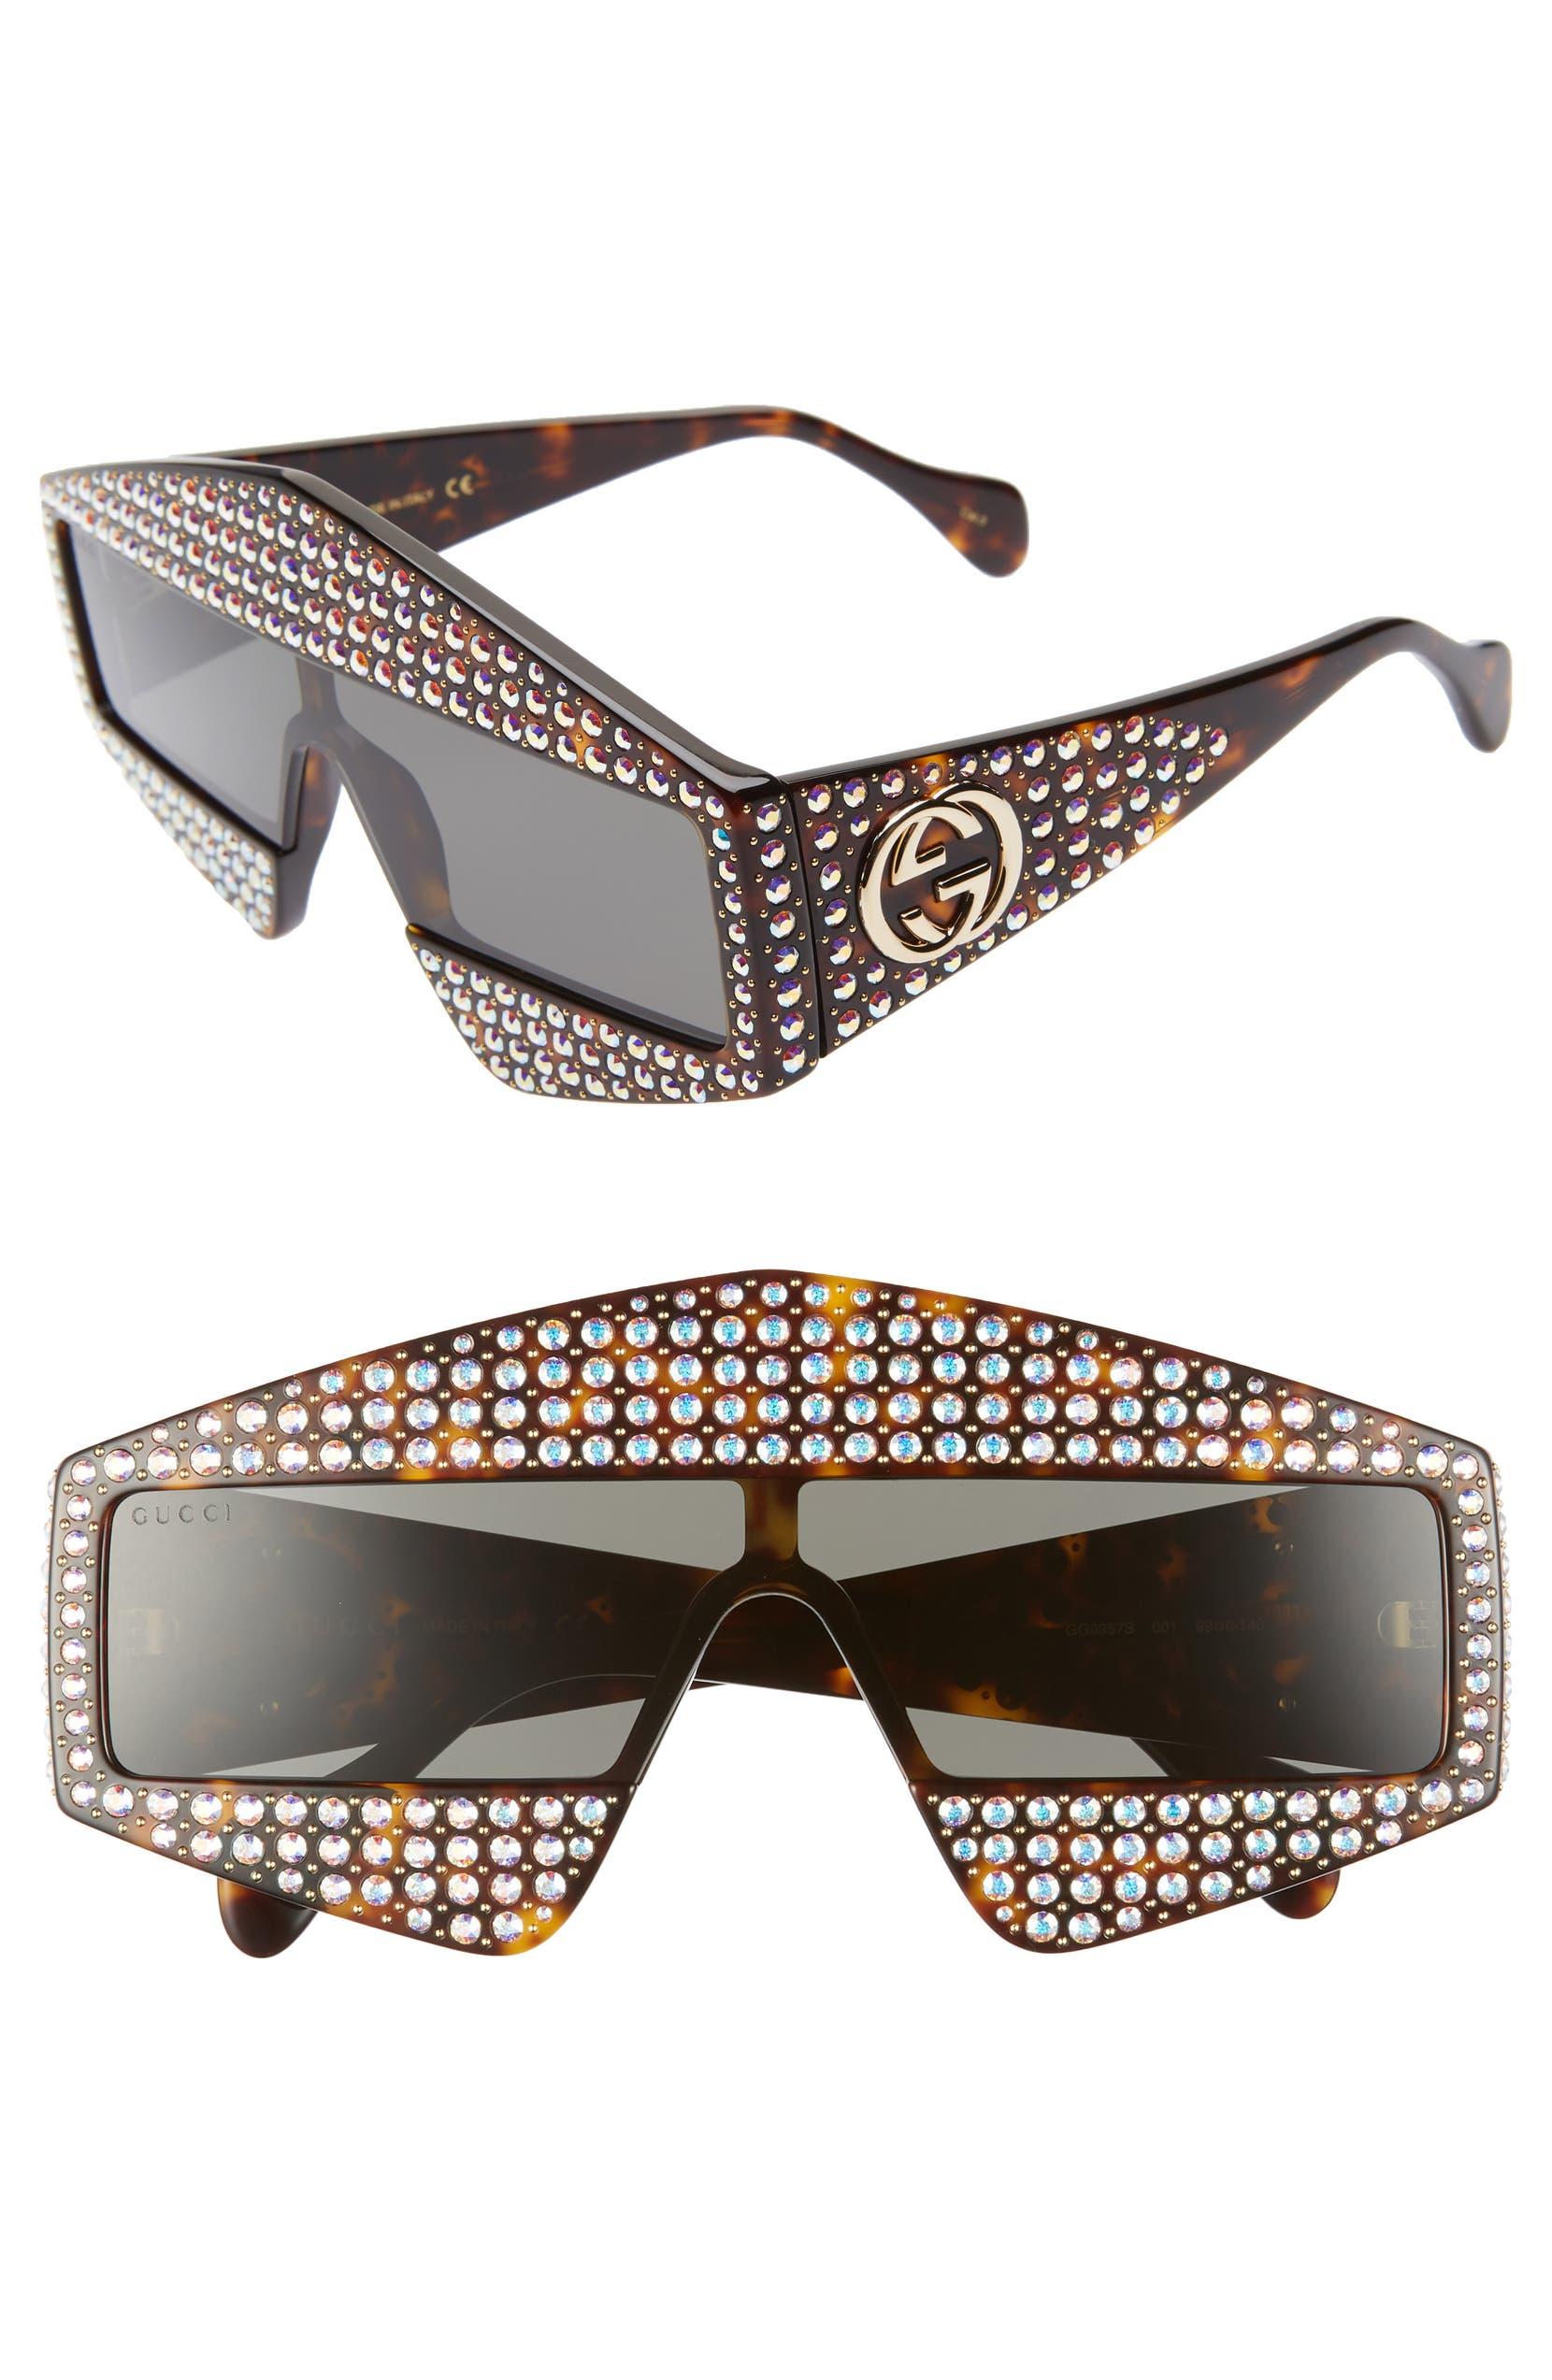 728ed4df2c920 Gucci 99mm Embellished Shield Sunglasses